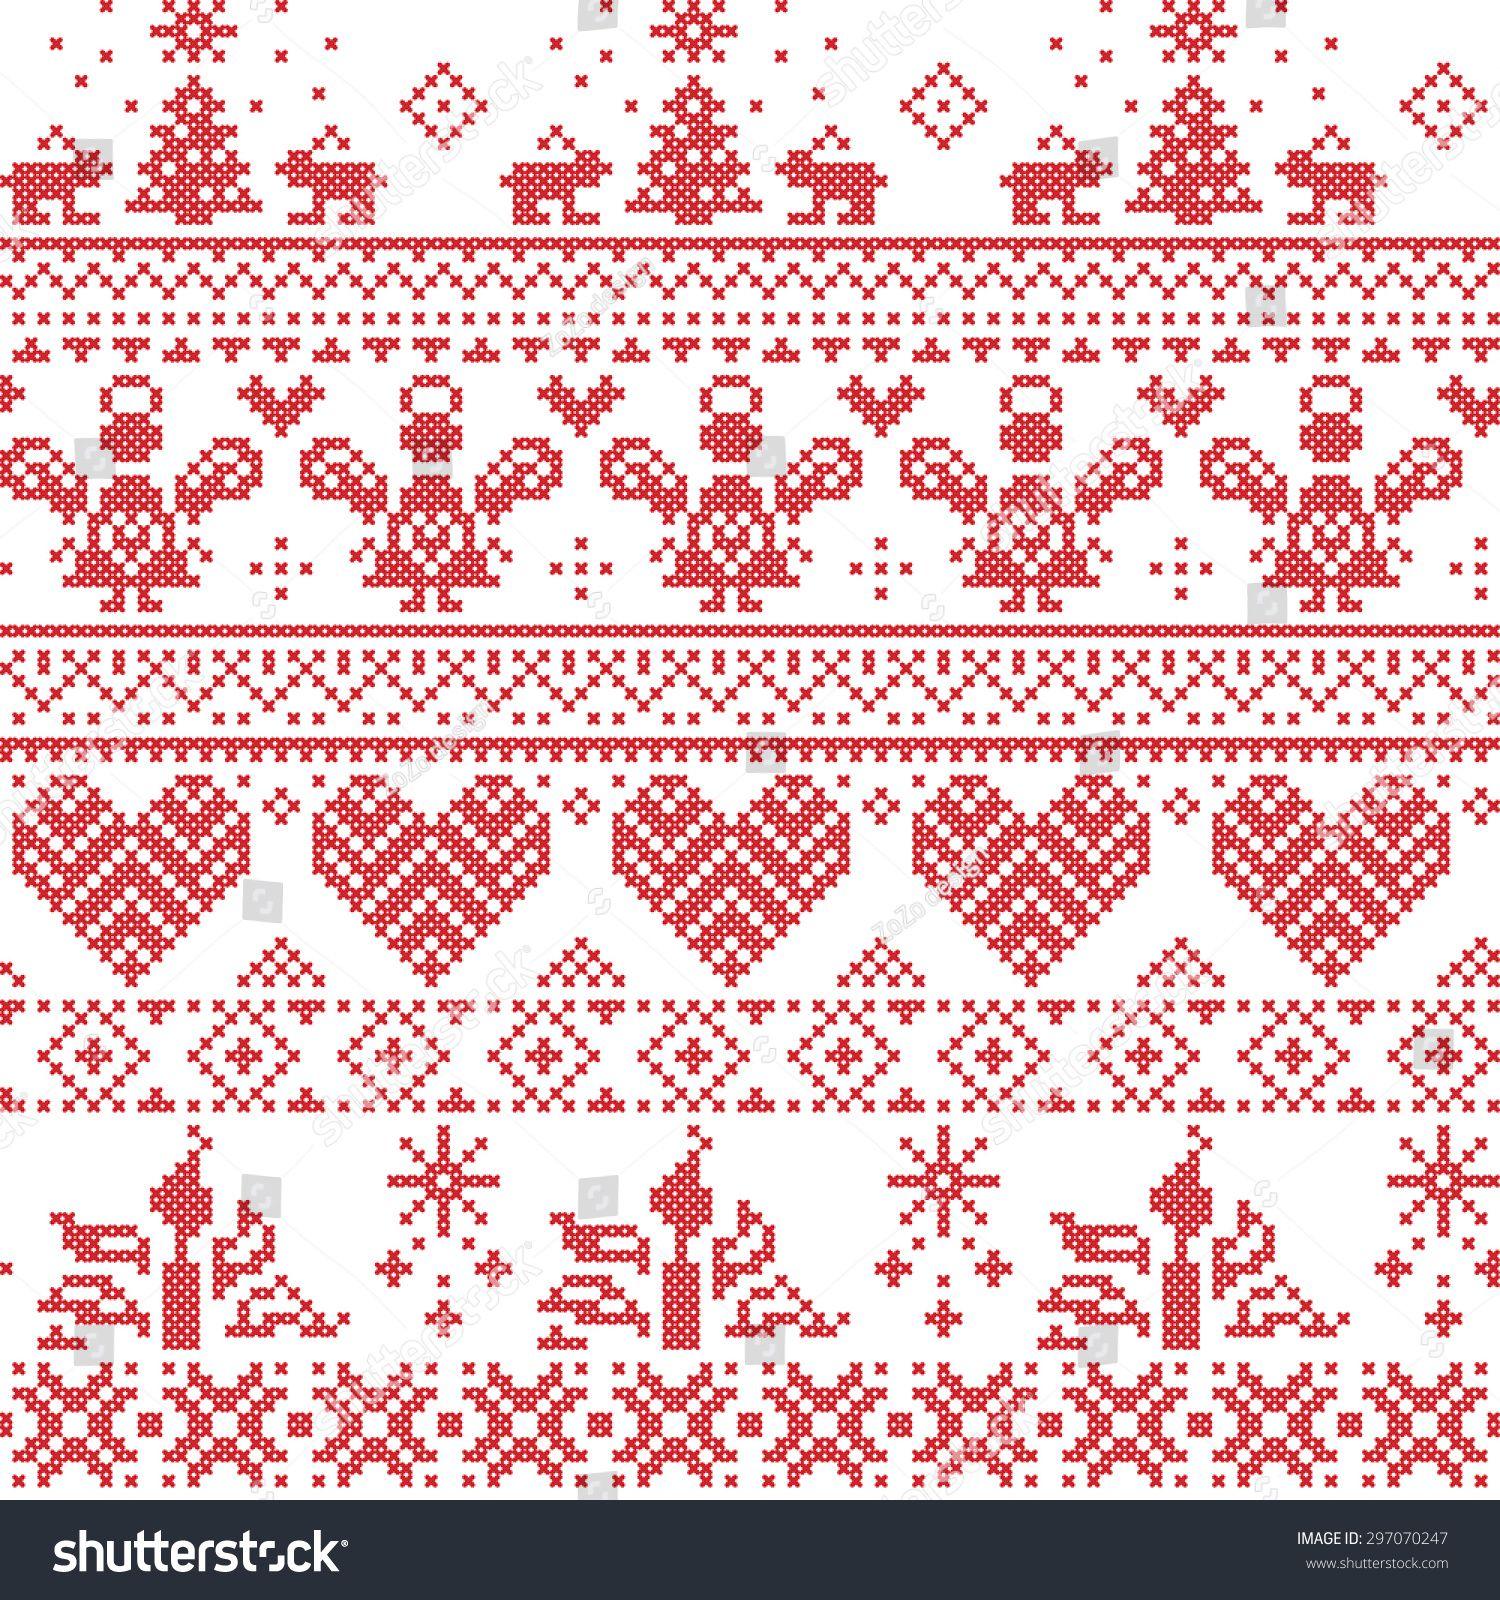 Scandinavian Nordic Christmas Seamless Cross Stitch Pattern With Angel Scandinavian Cross Stitch Cross Stitch Border Pattern Scandinavian Cross Stitch Patterns